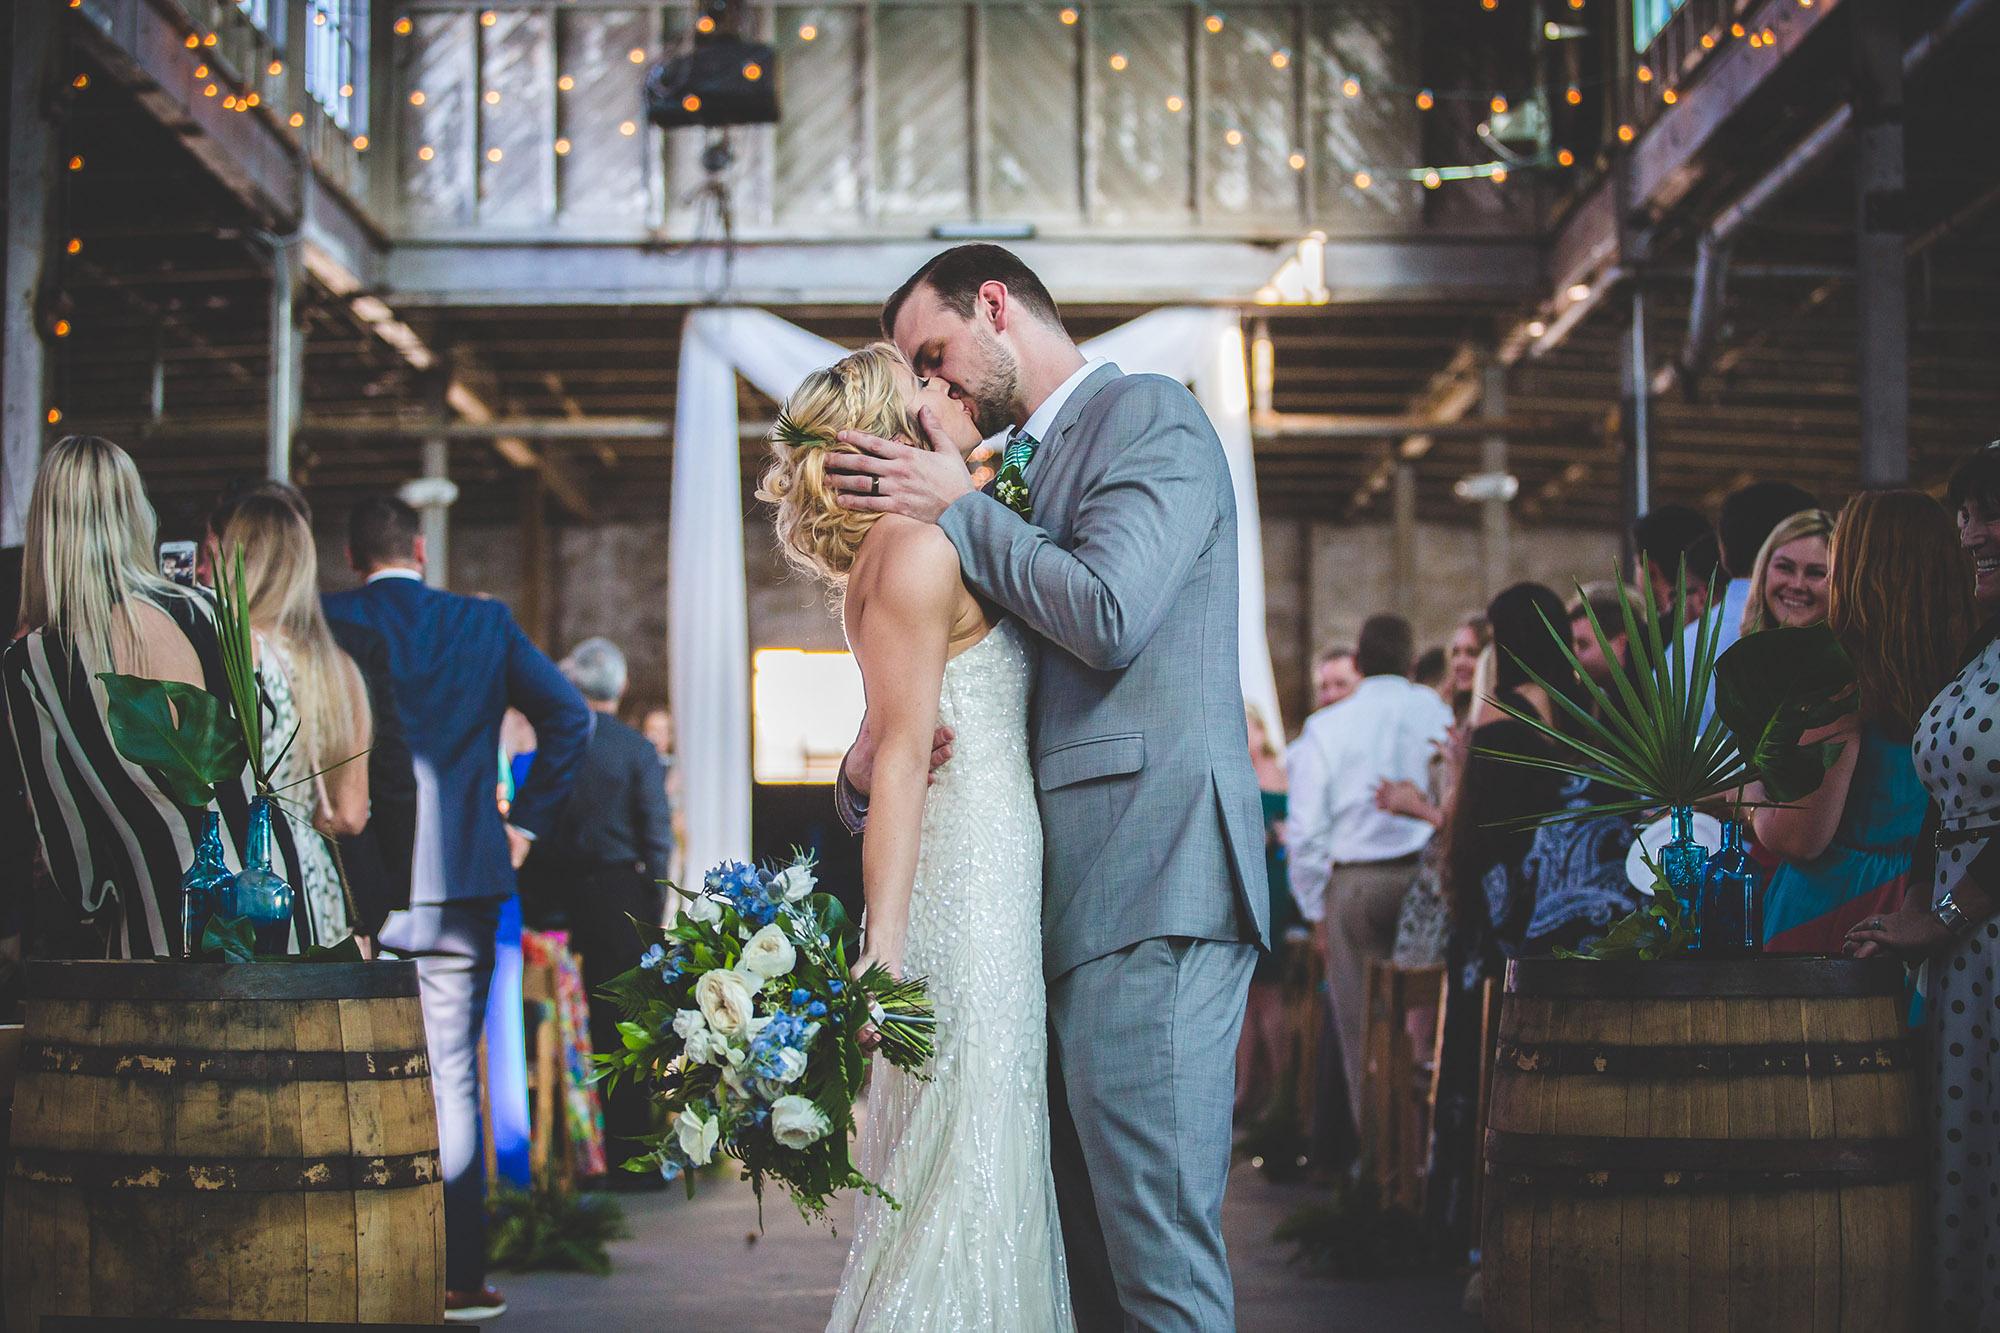 adam-szarmack-weddings-1.jpg